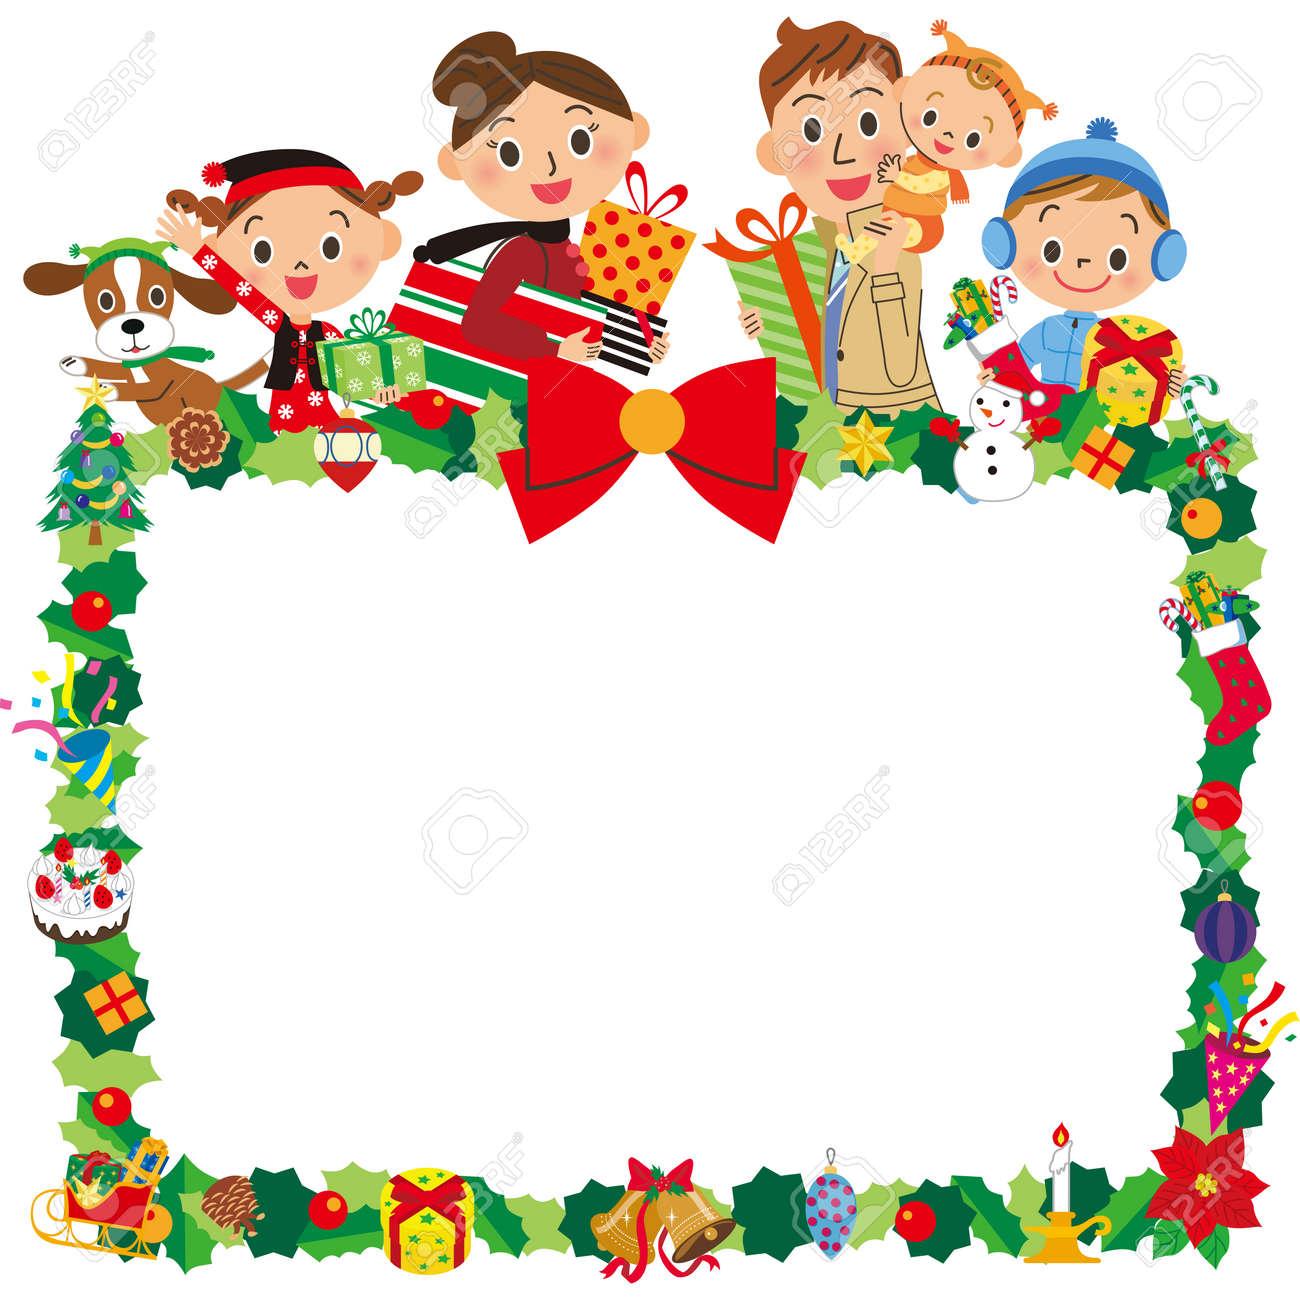 Family And Christmas Frame Stock Vector